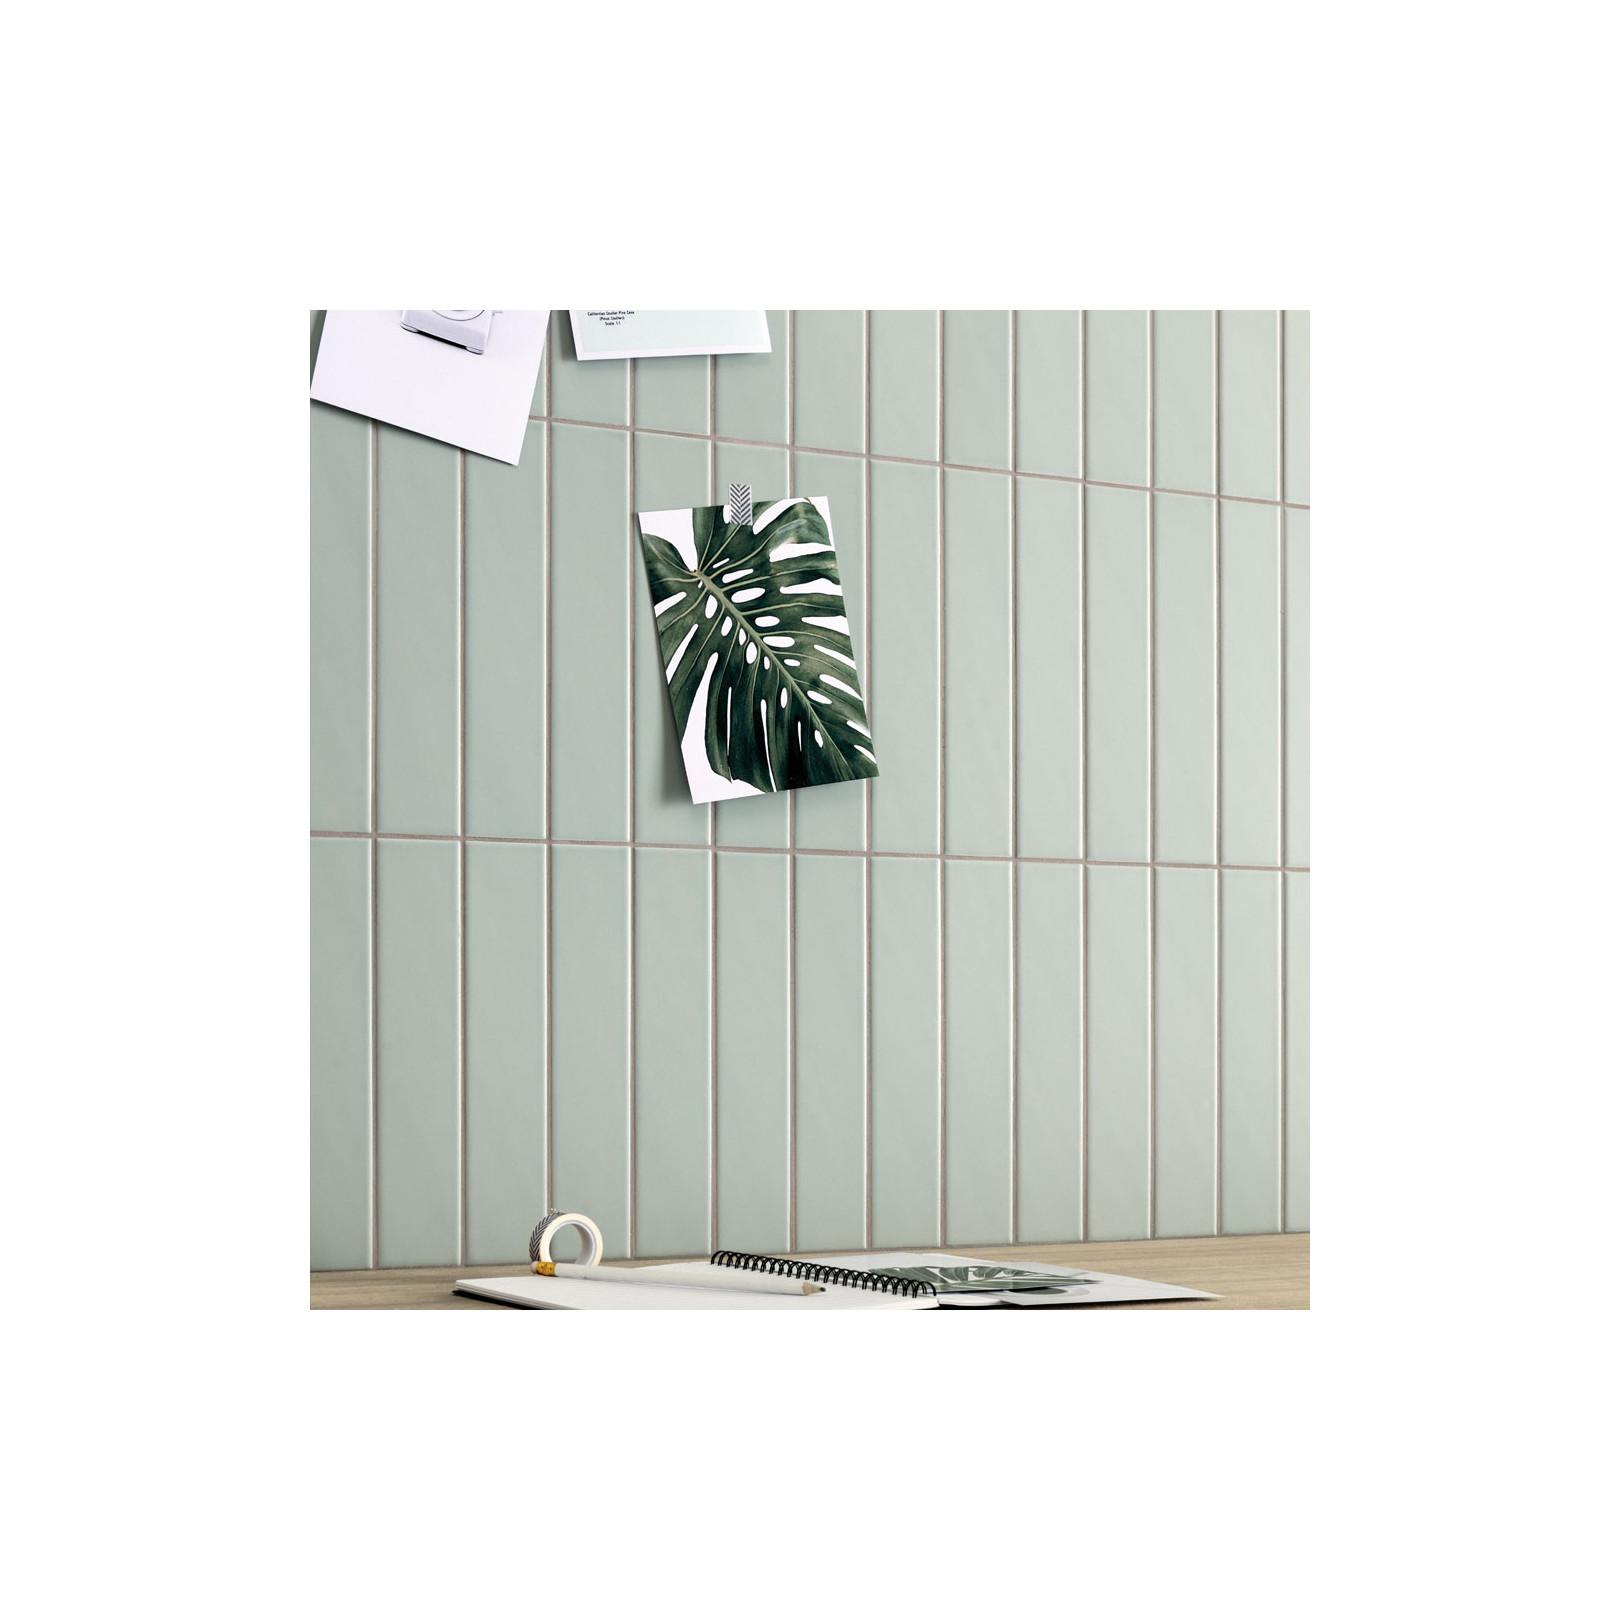 Carrelage grès cérame Genesi Wall 25x5cm (7 couleurs)